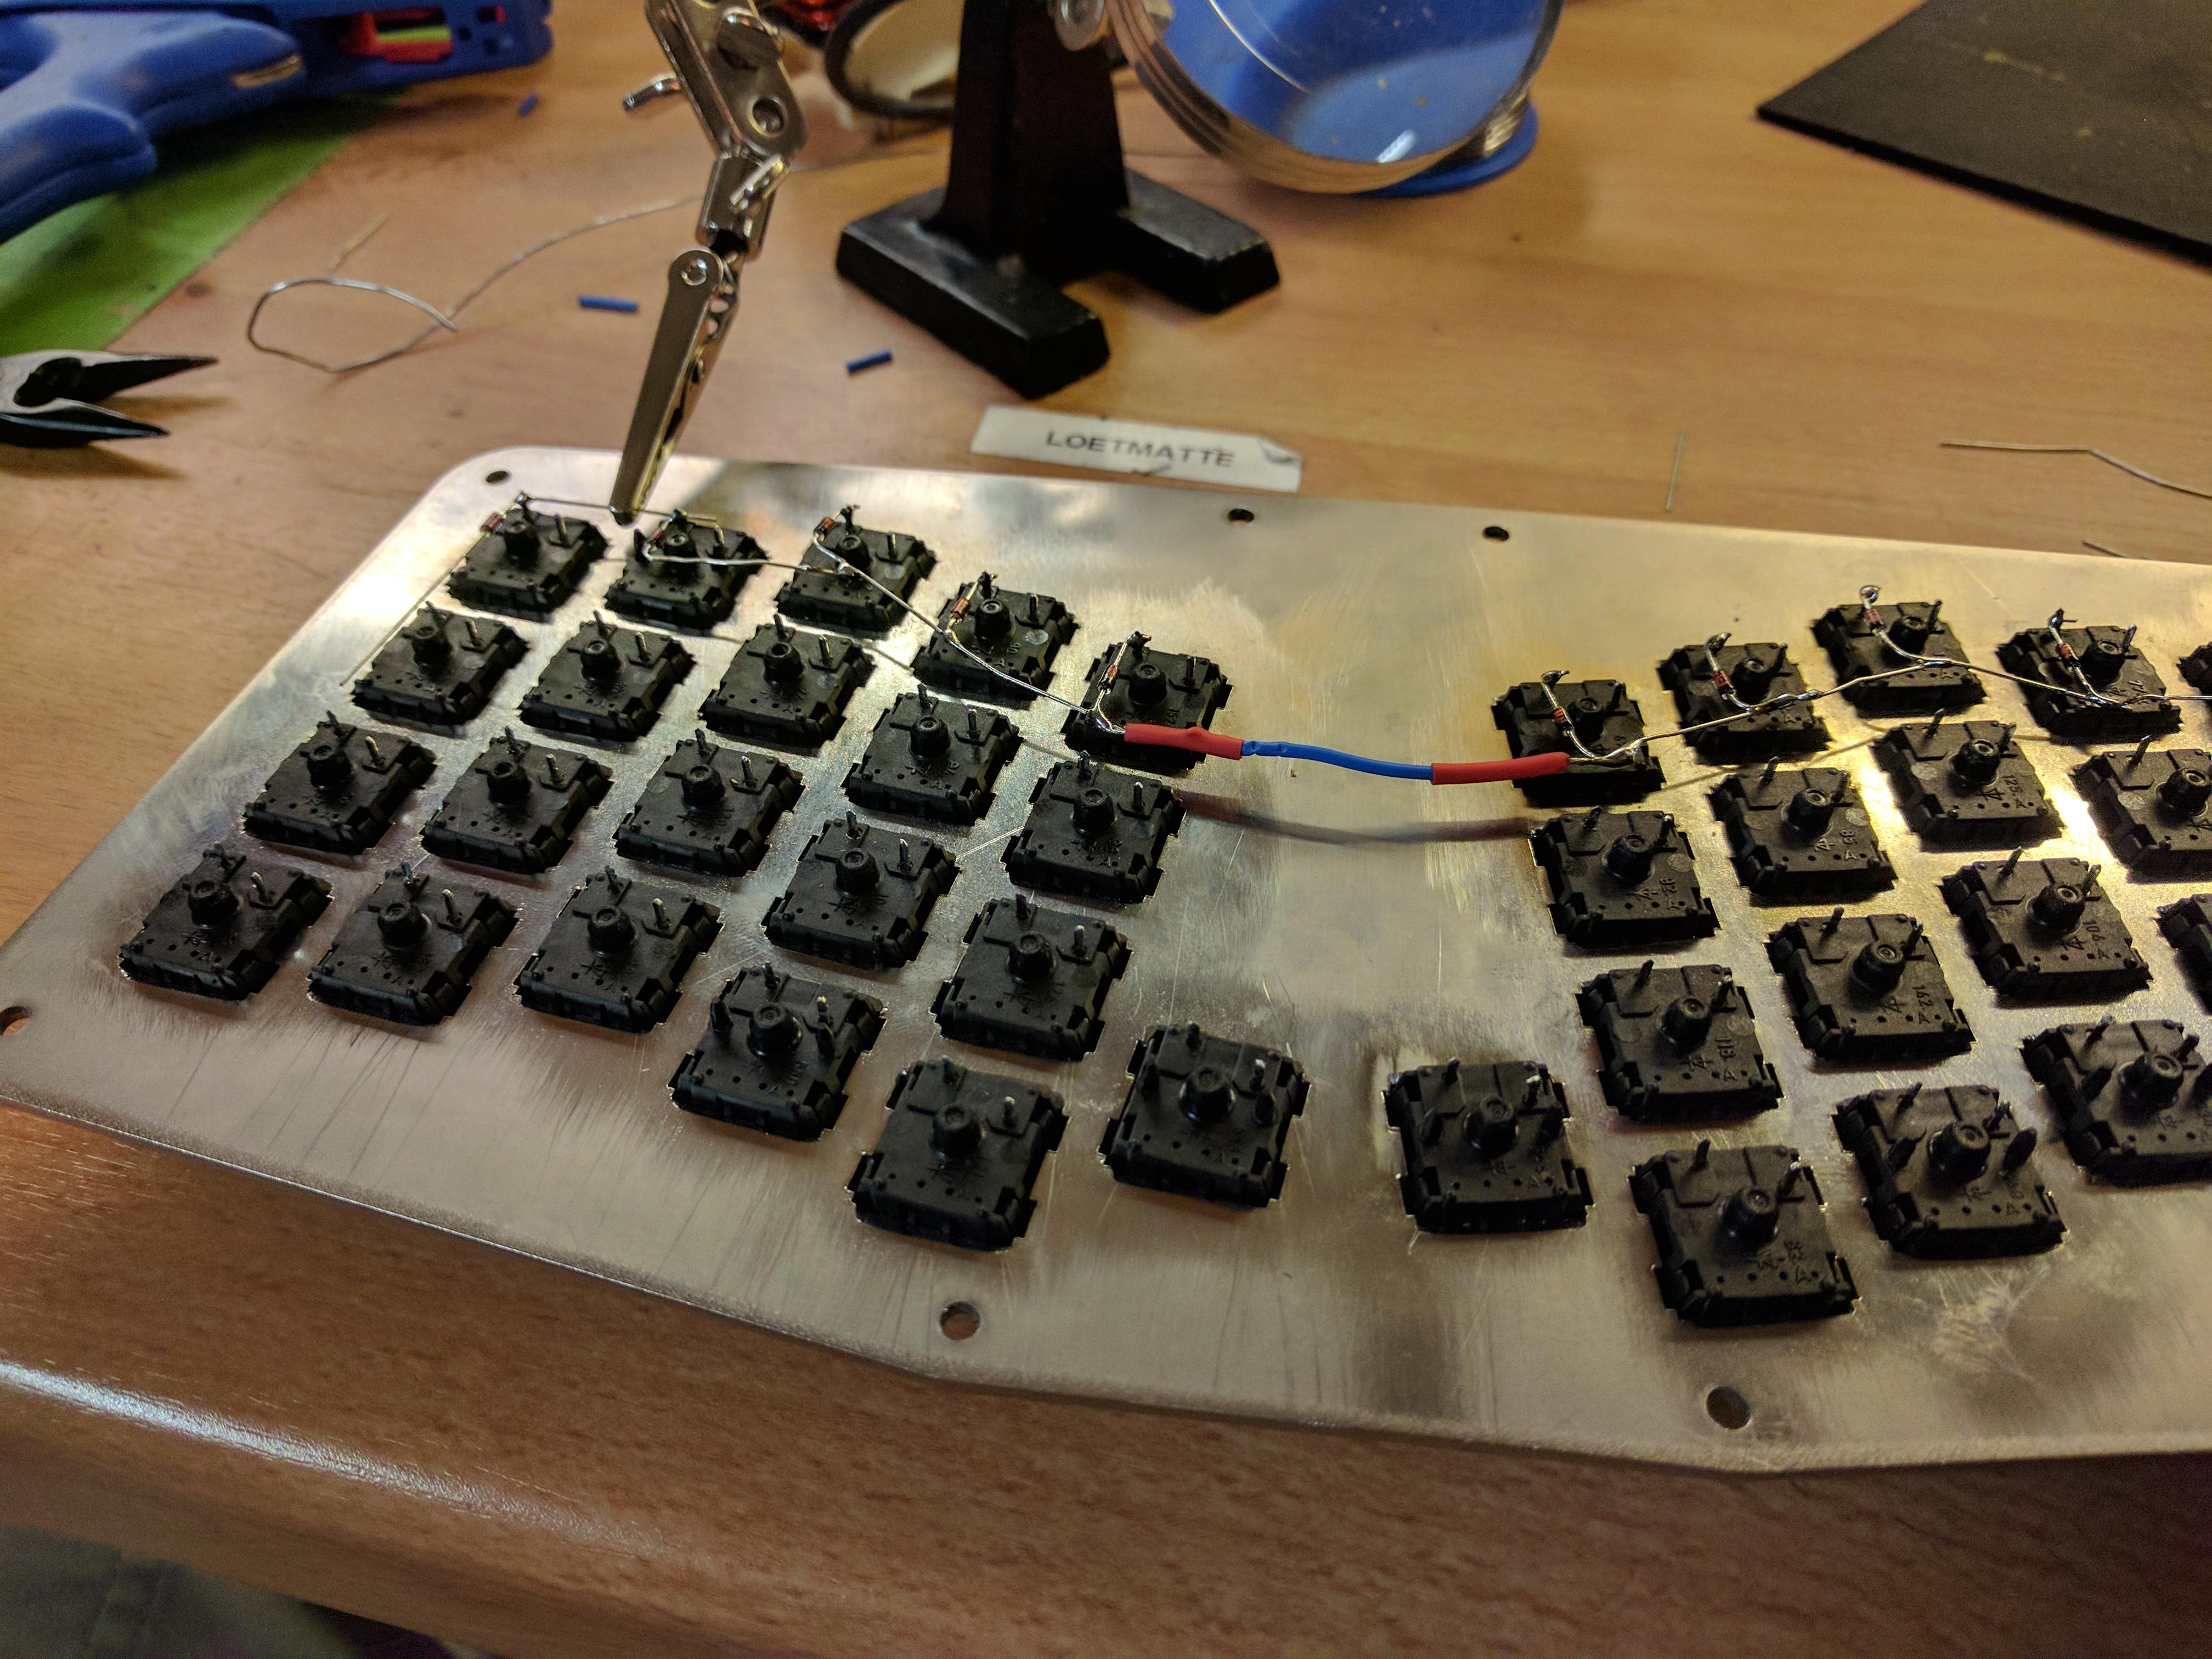 Atreus: Building a custom ergonomic keyboard - Henri Bergius